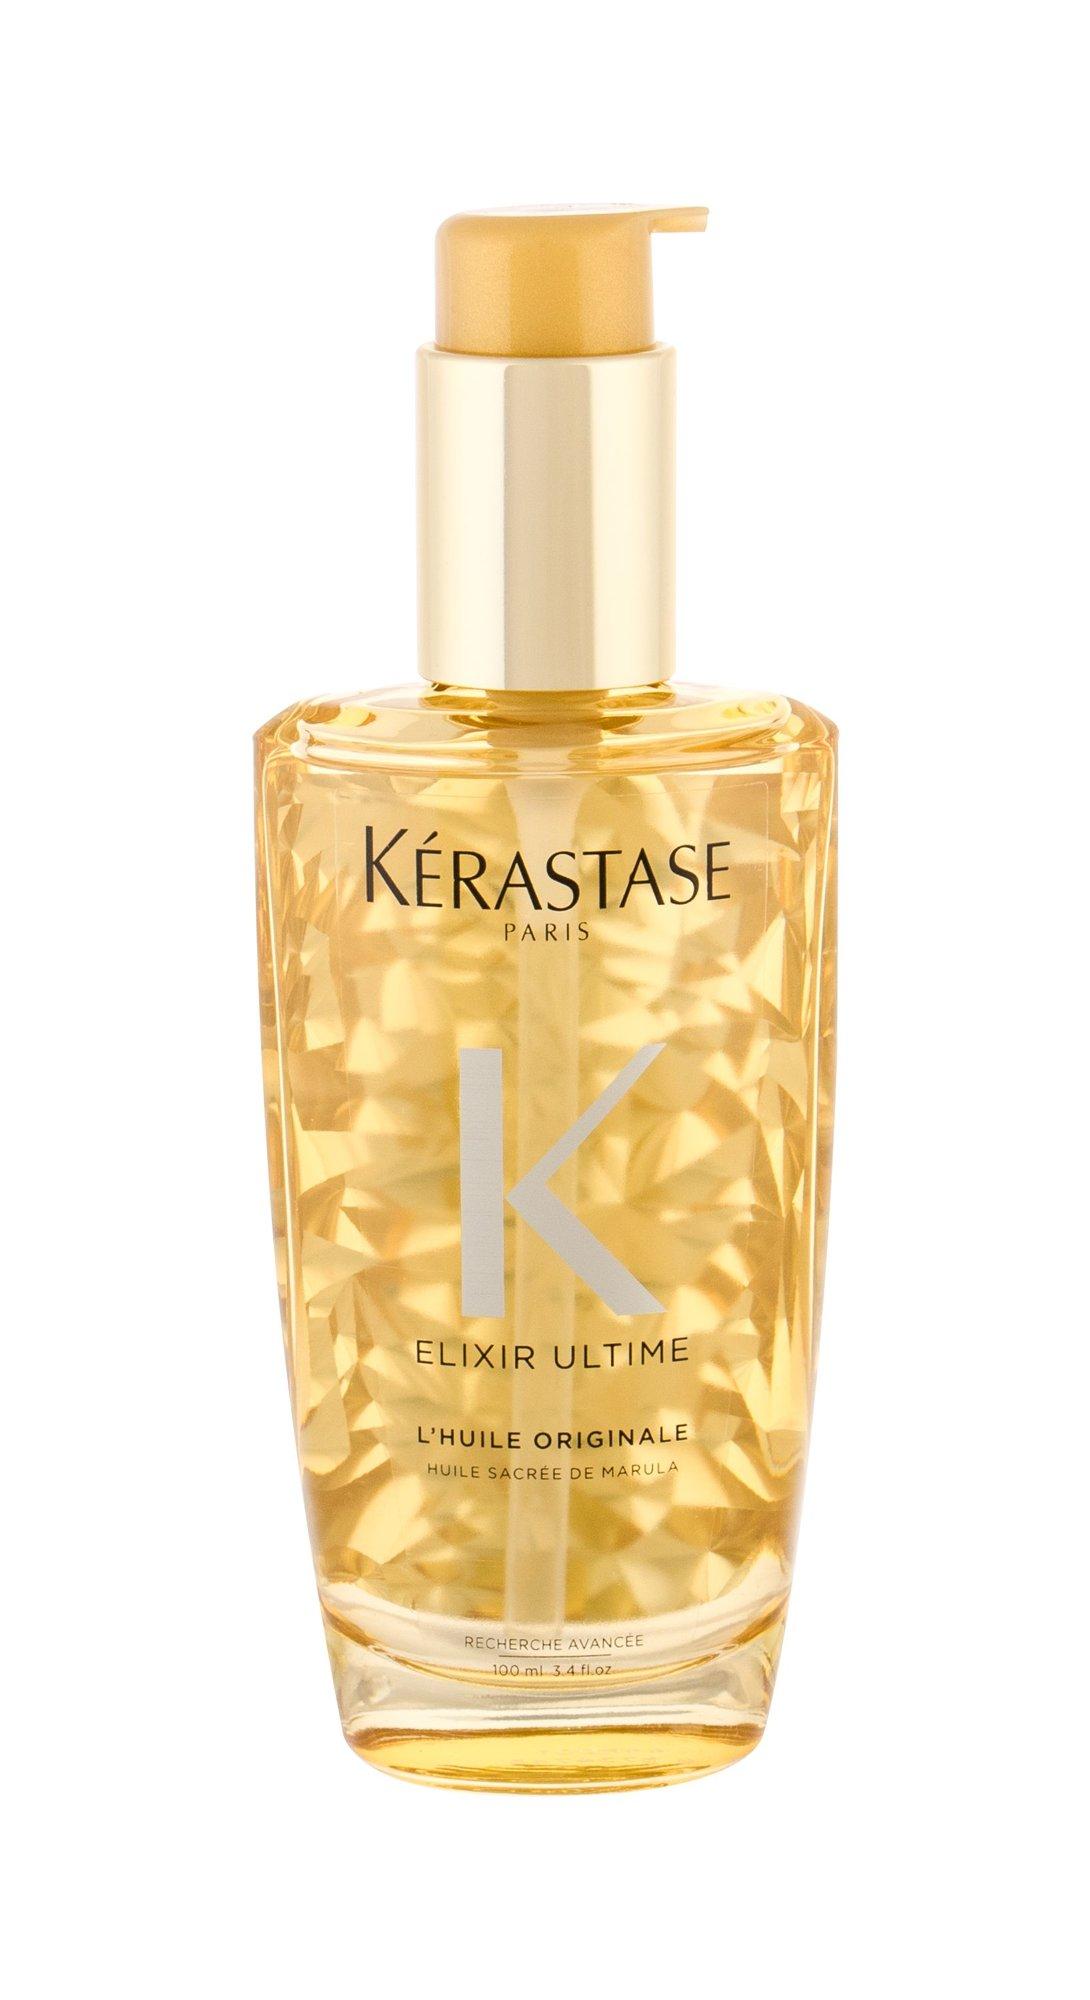 Kérastase Elixir Ultime Hair Oils and Serum 100ml